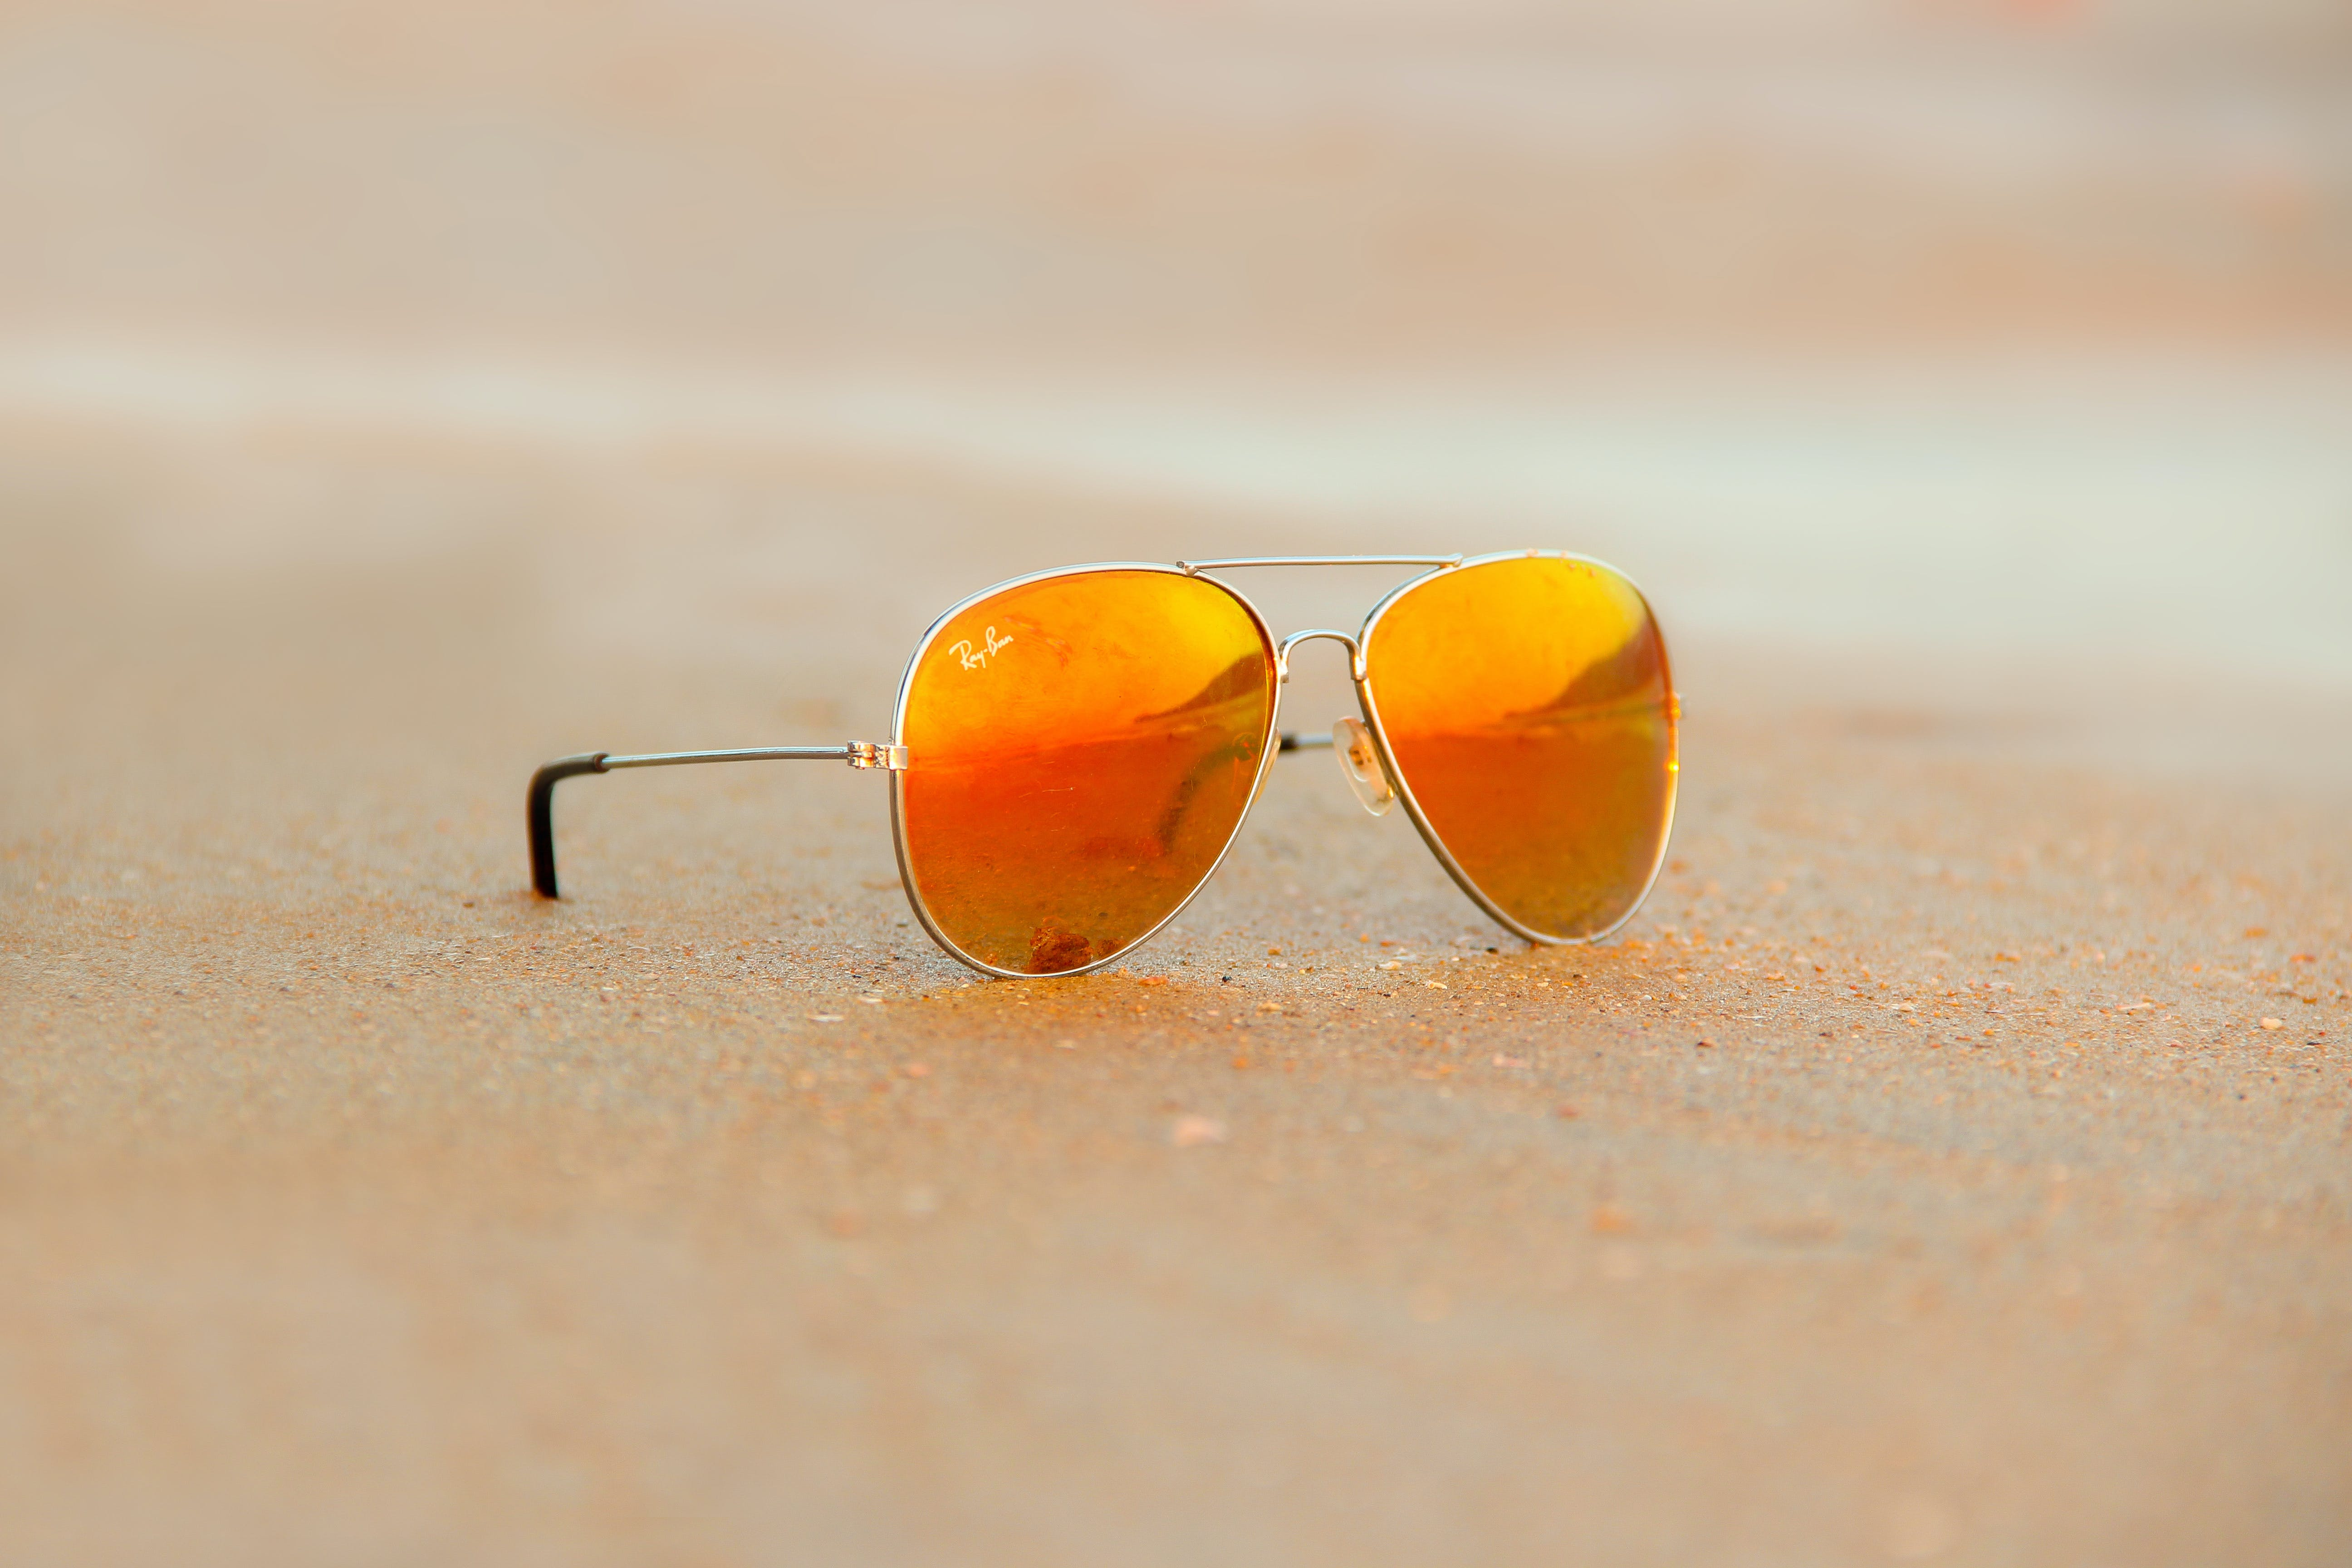 Close-up of Rayban Sunglasses